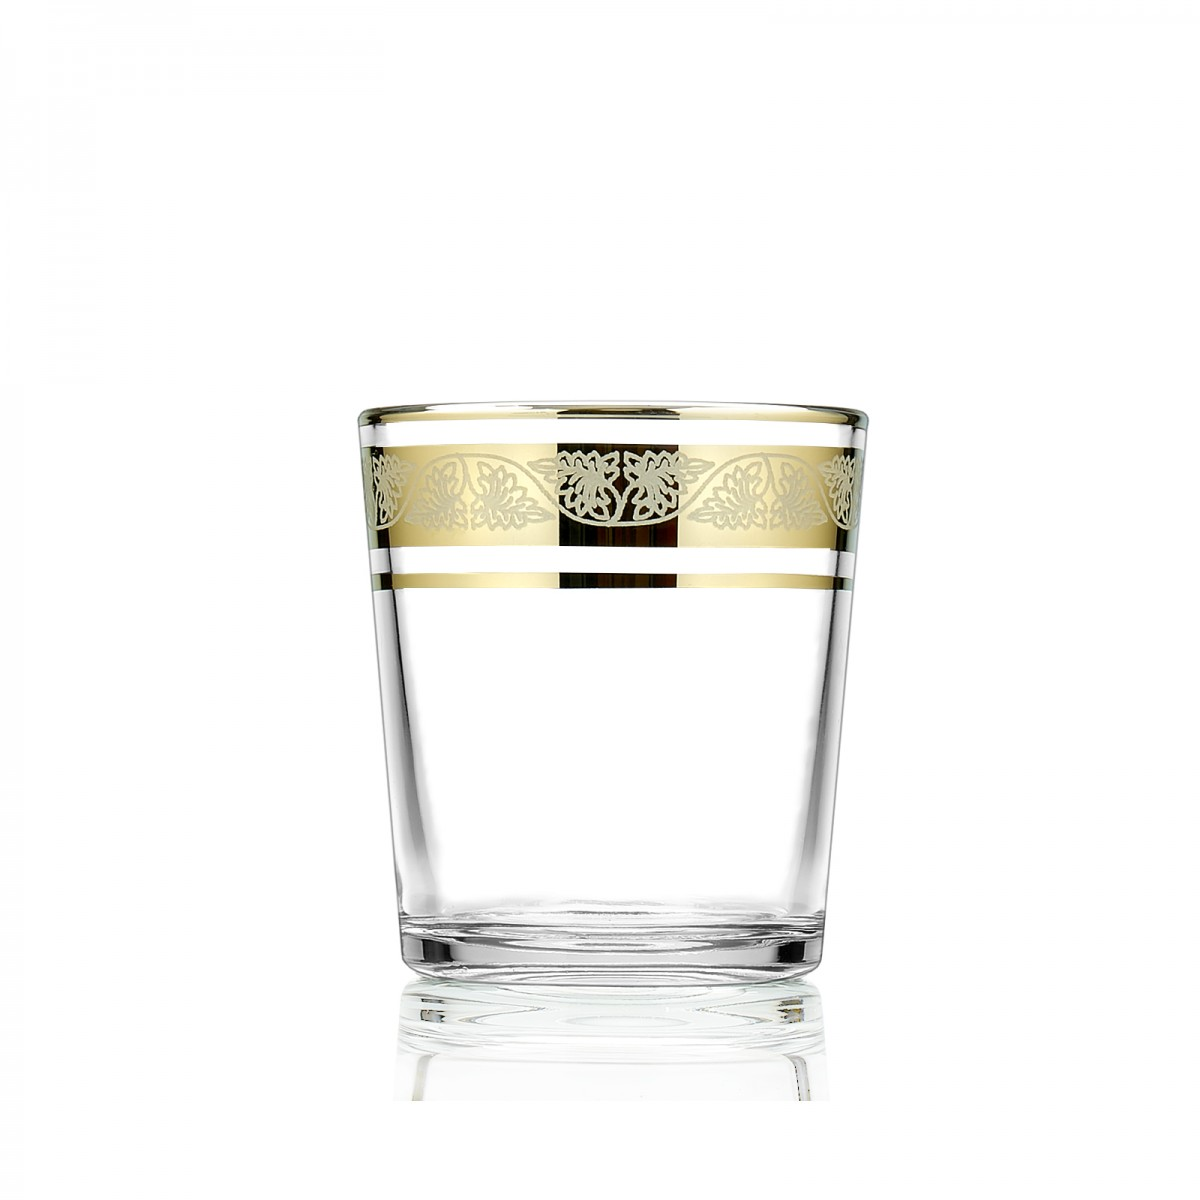 GN22_40_1 Набор из 6 стаканов «Лоза», 250 мл